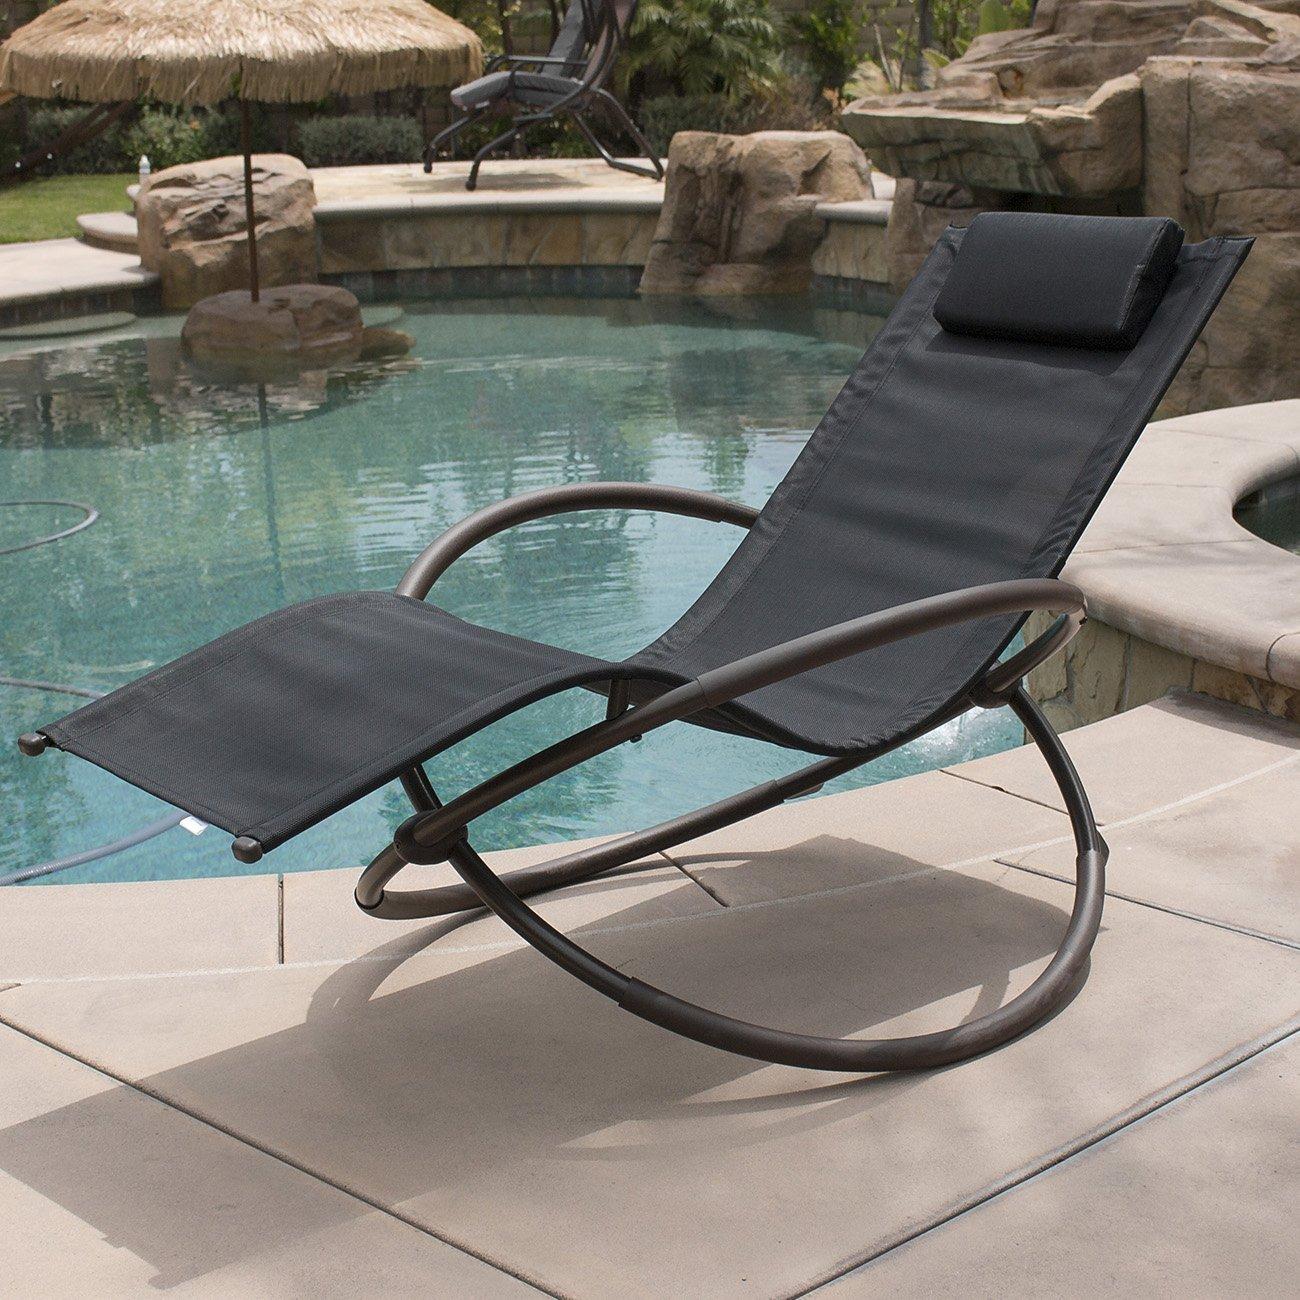 Gentil Belleze Zero Gravity Orbital Lounger Rocking Chair Outdoor Patio Yard  Furniture, (Black)